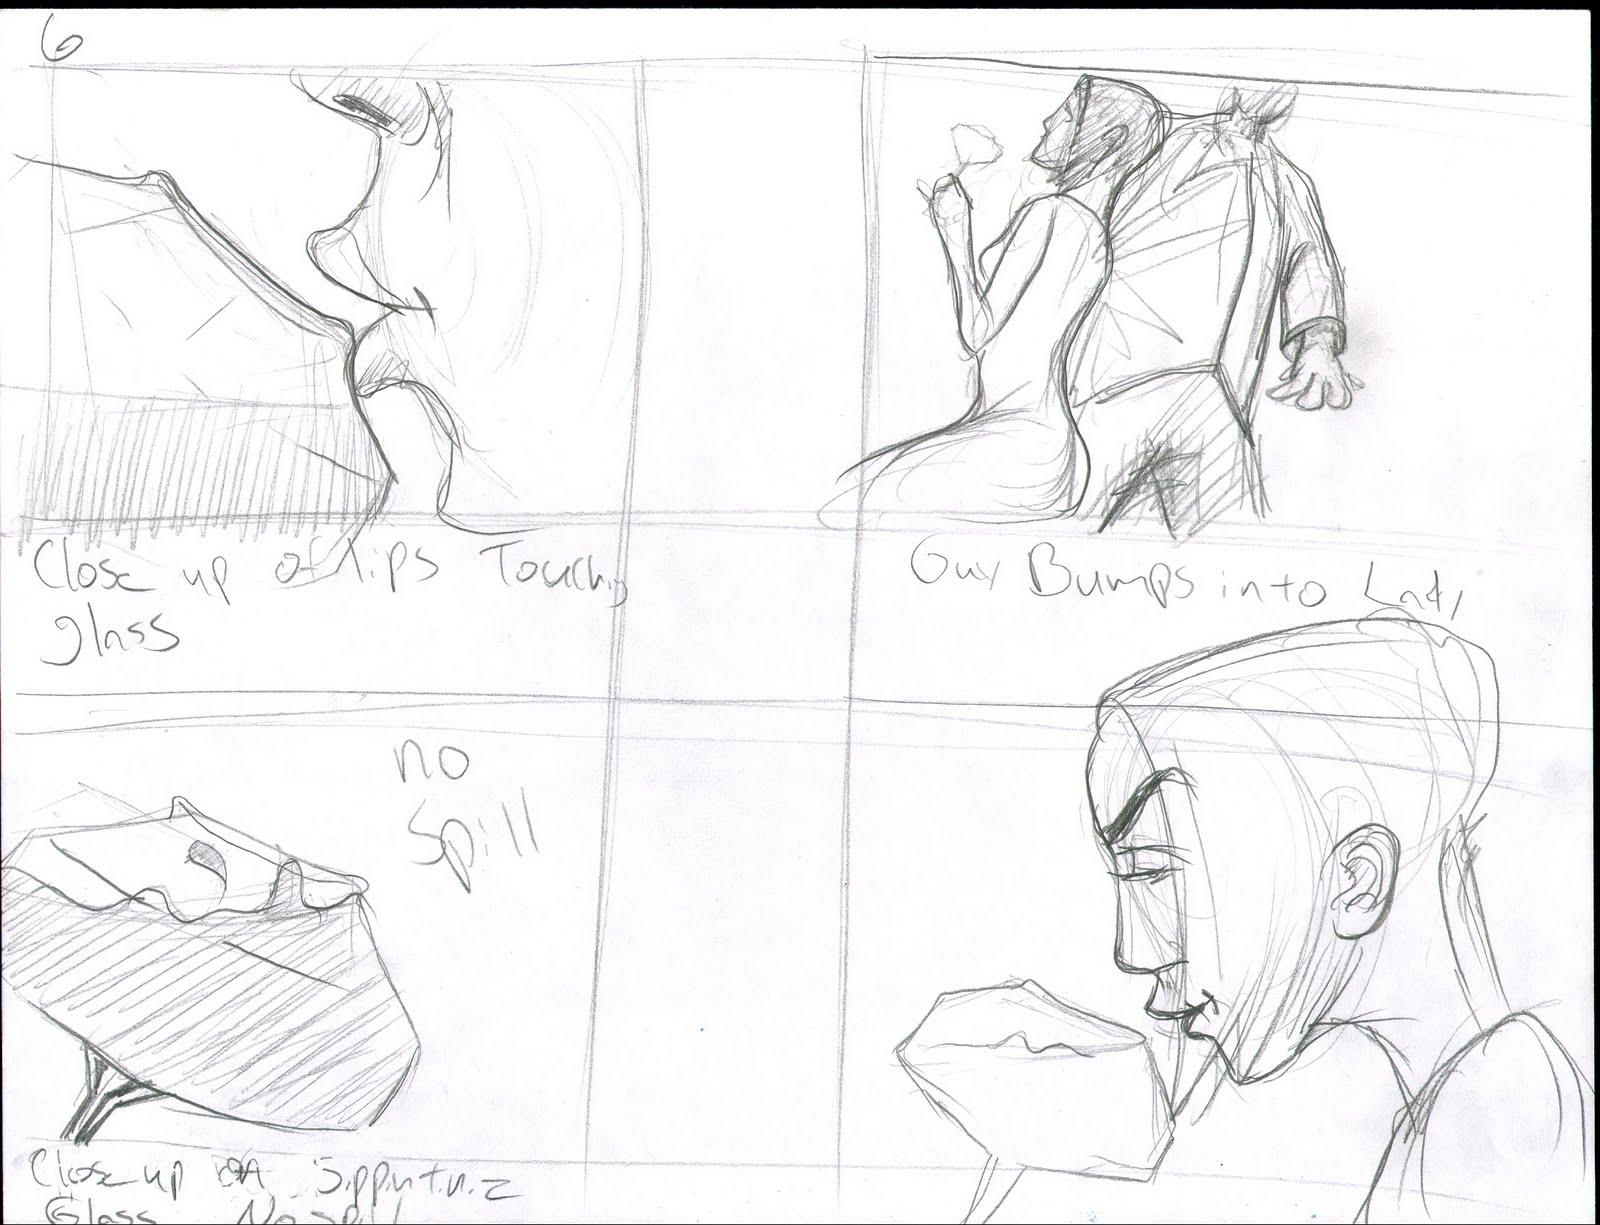 1600x1225 Drawings,animation Test,debates,gossip,technique. Storyboard(No